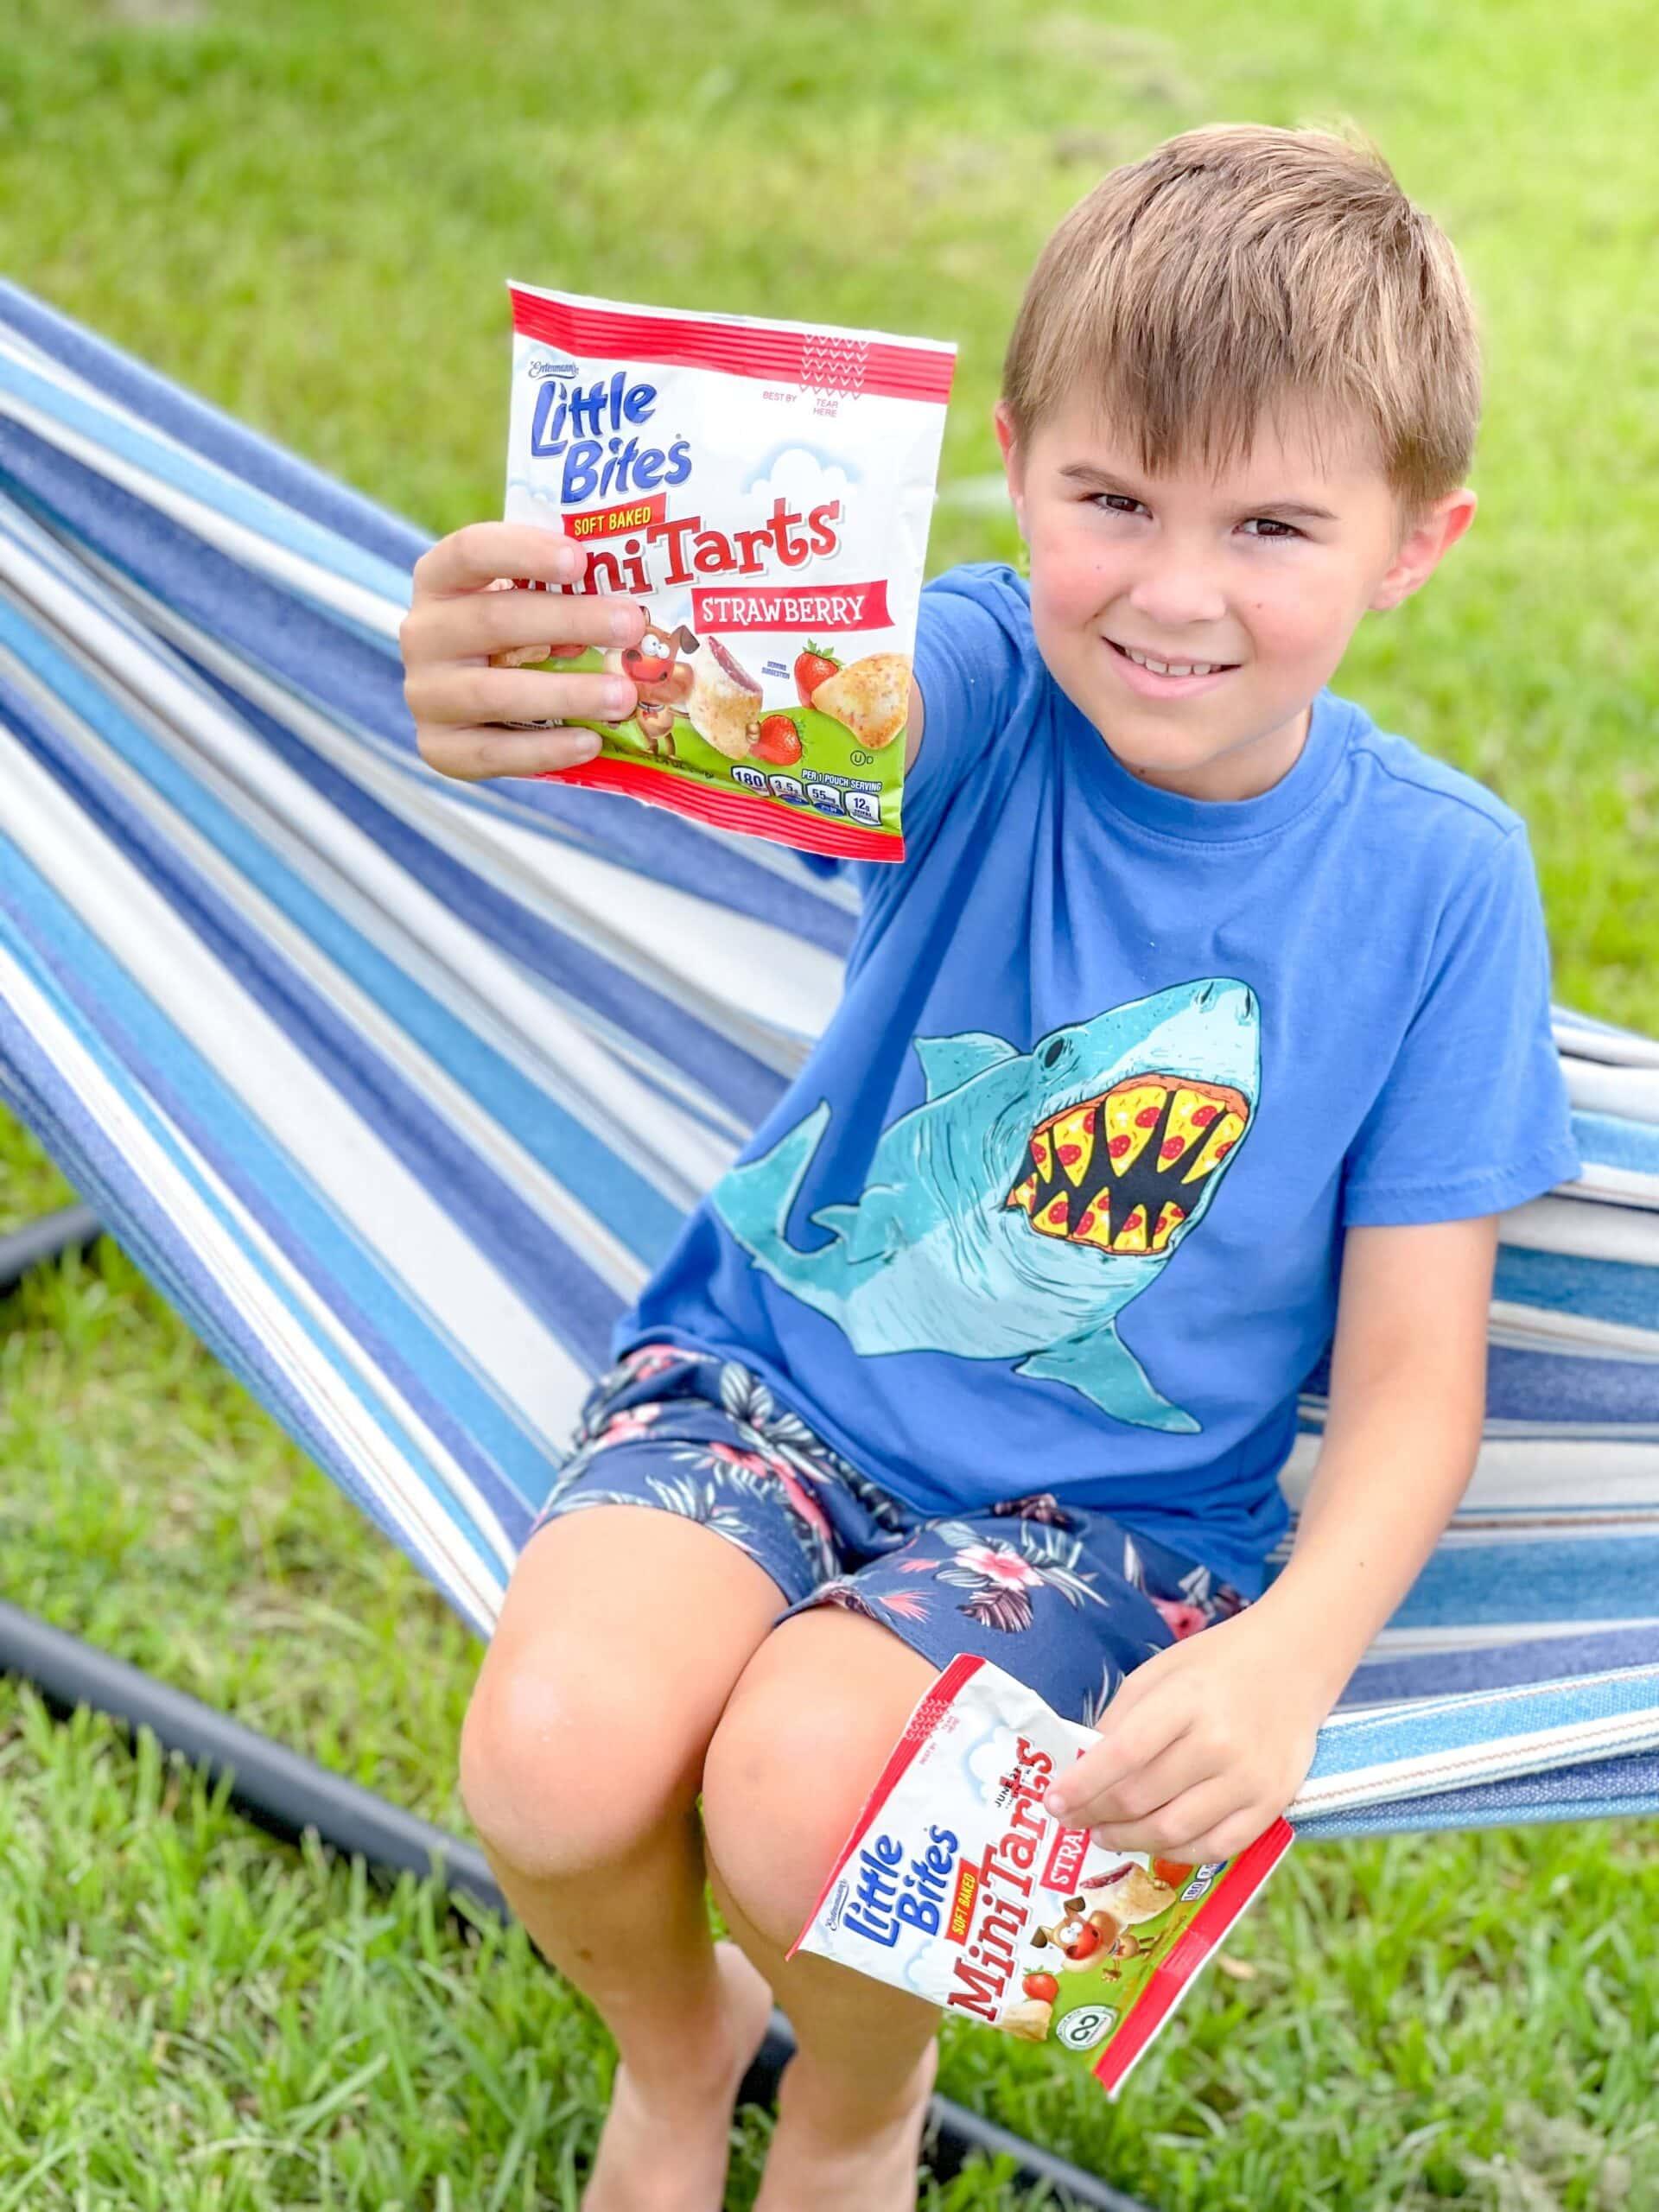 Fun Summer Ideas For Families | Entenmann's Little Bites® Mini Tarts